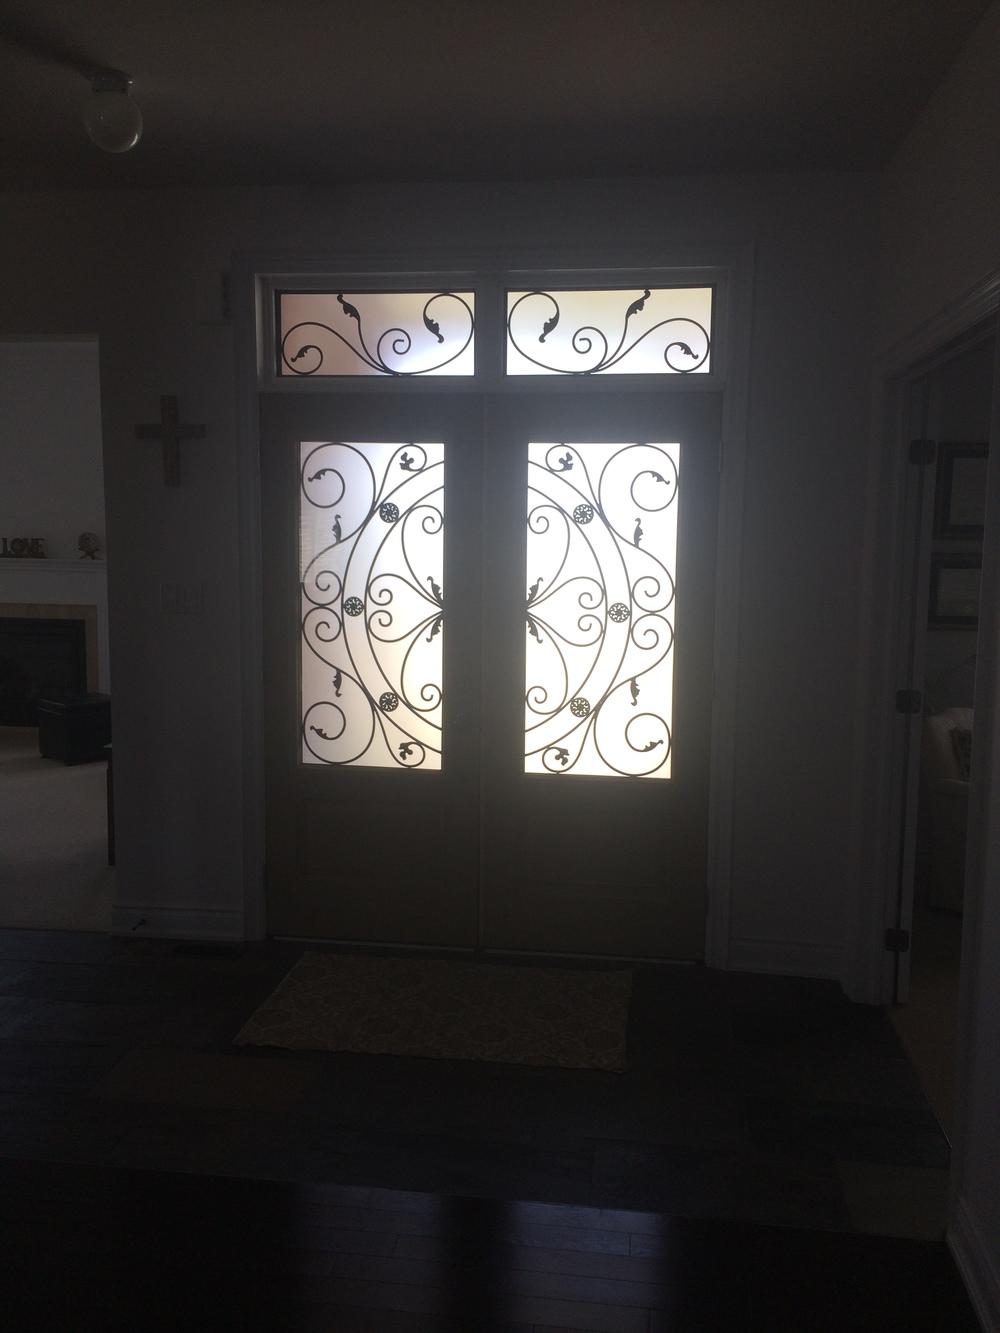 Campbellsford-Wrought-Iron-Glass-Door-Inserts-Markham-Ontario